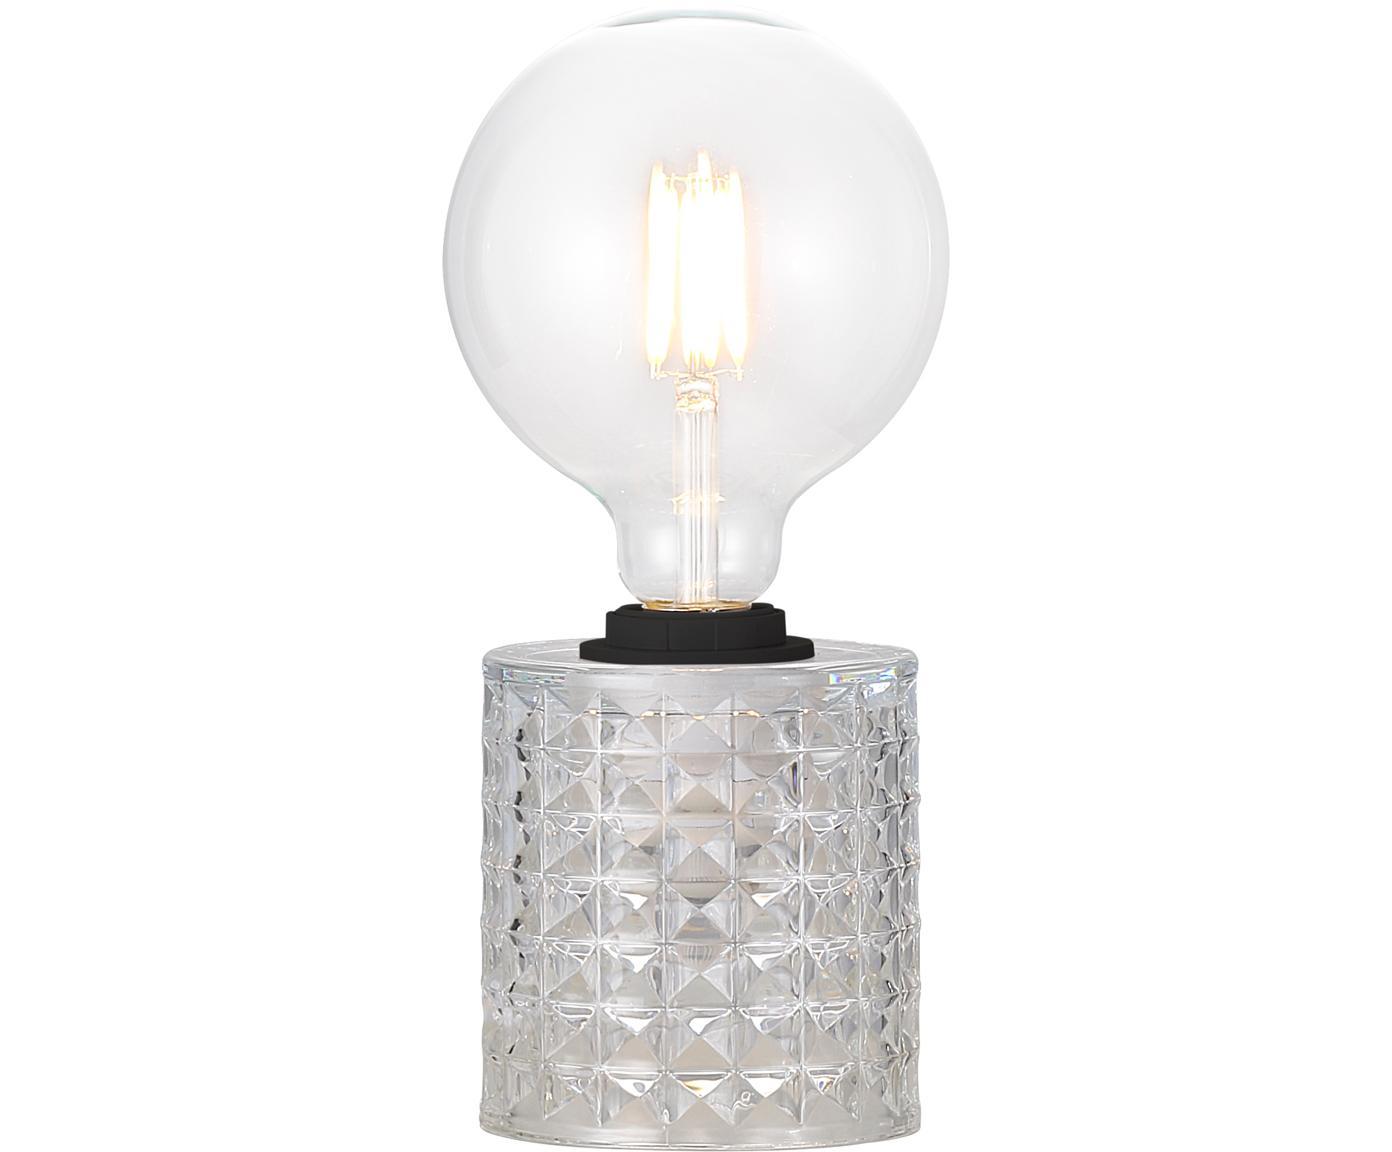 Tafellamp Hollywood van glas, Fitting: kunststof, Transparant, Ø 11 x H 13 cm